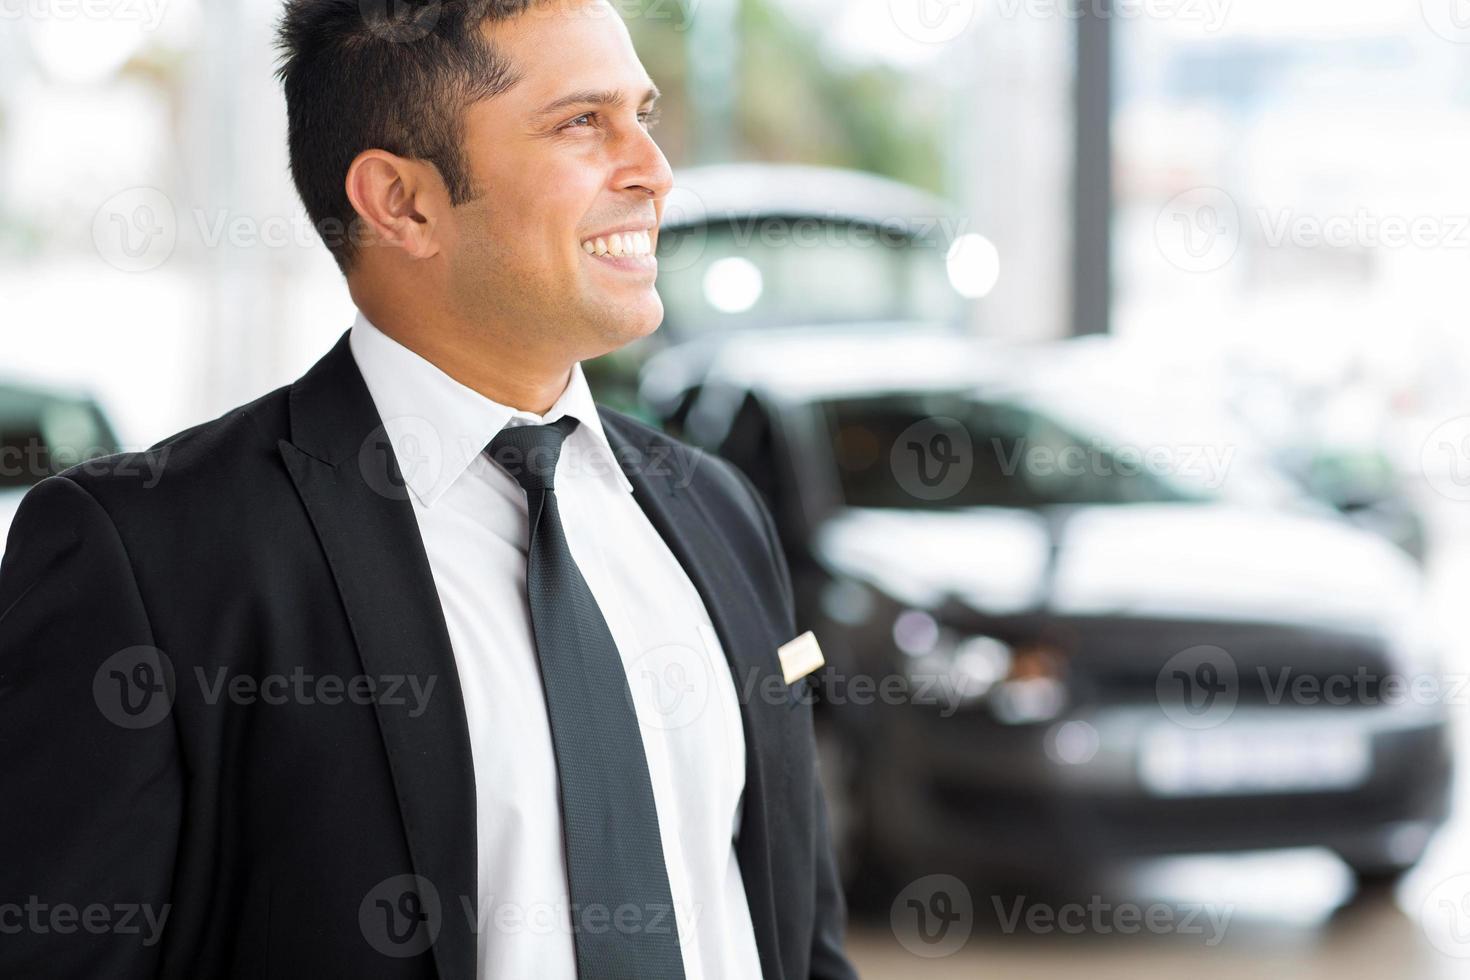 selbstbewusster Autohausverkäufer foto